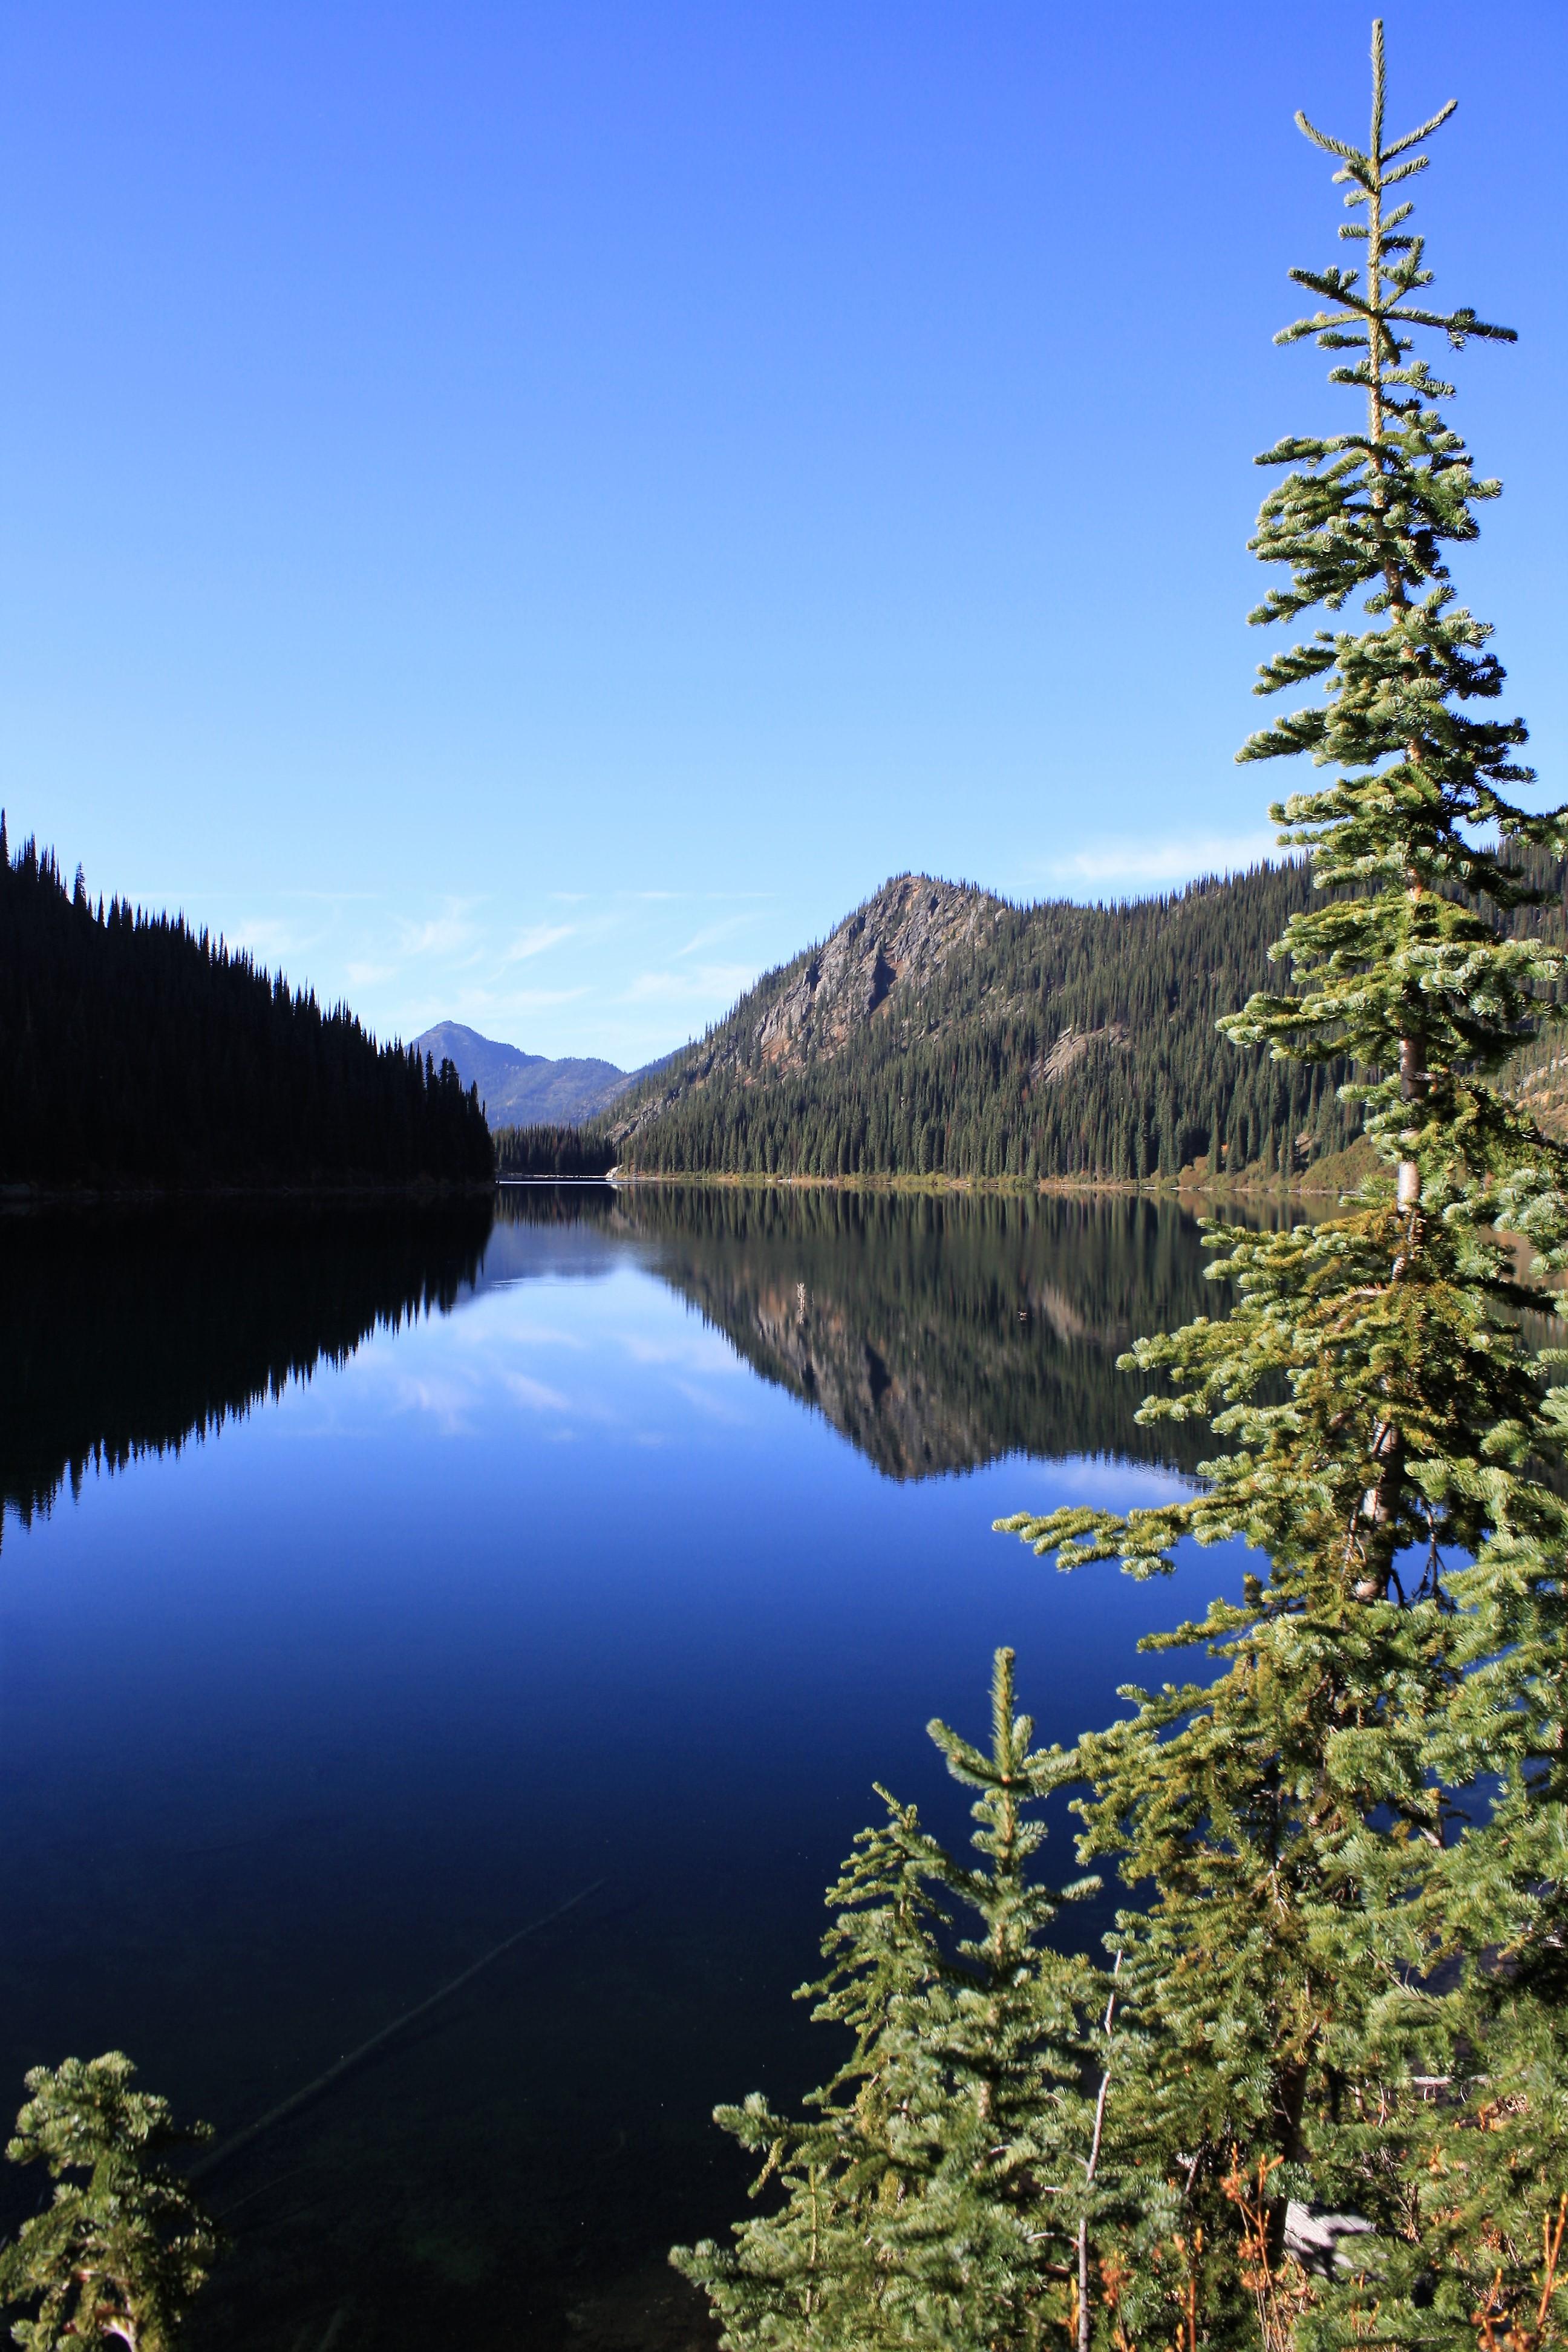 DM_nature_landscape_plaidlake_0518